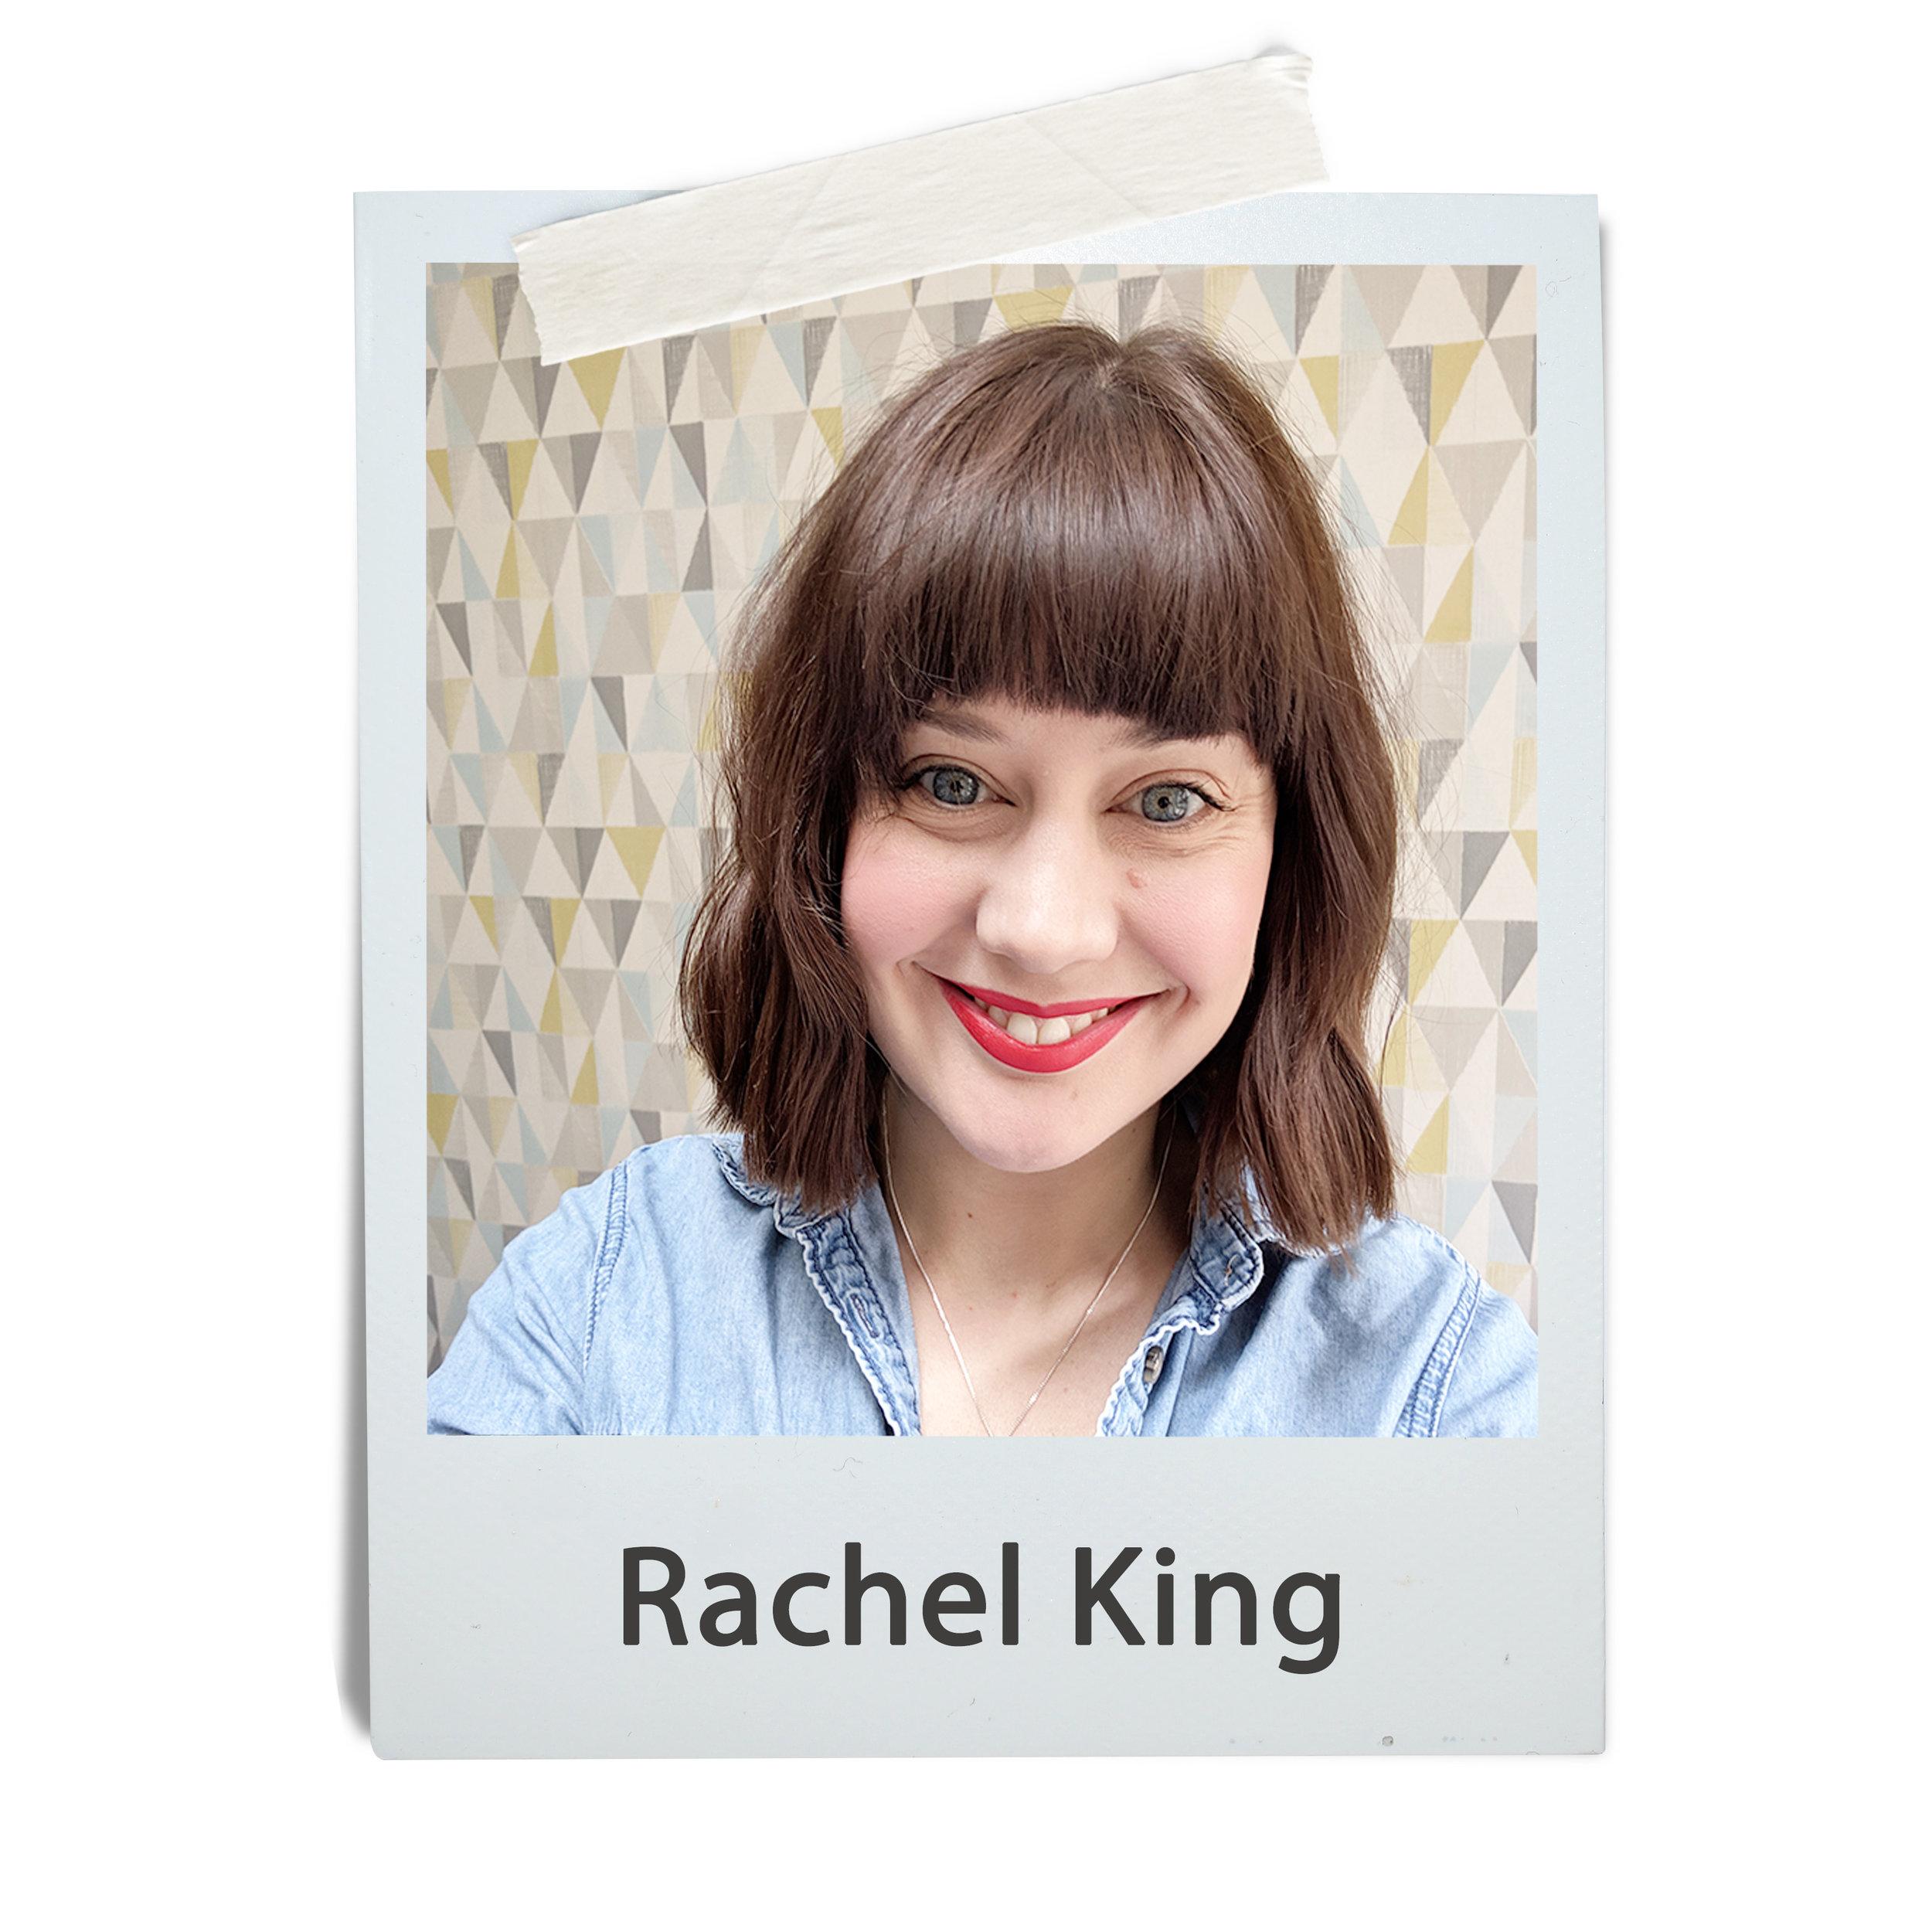 Rachel King